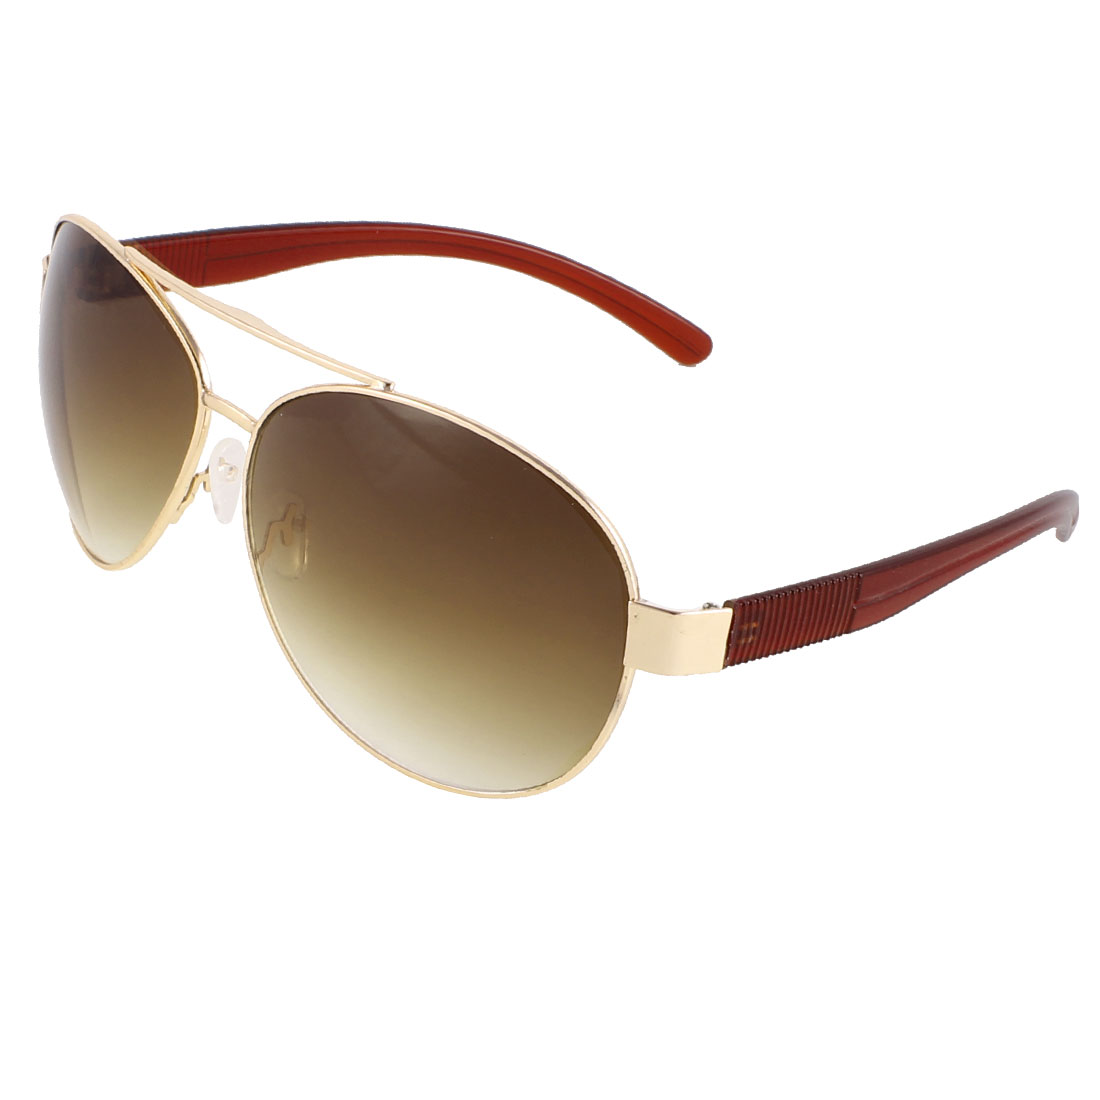 Men Traveling Gold Tone Slim Metal Browm Lens Protective Sunglasses